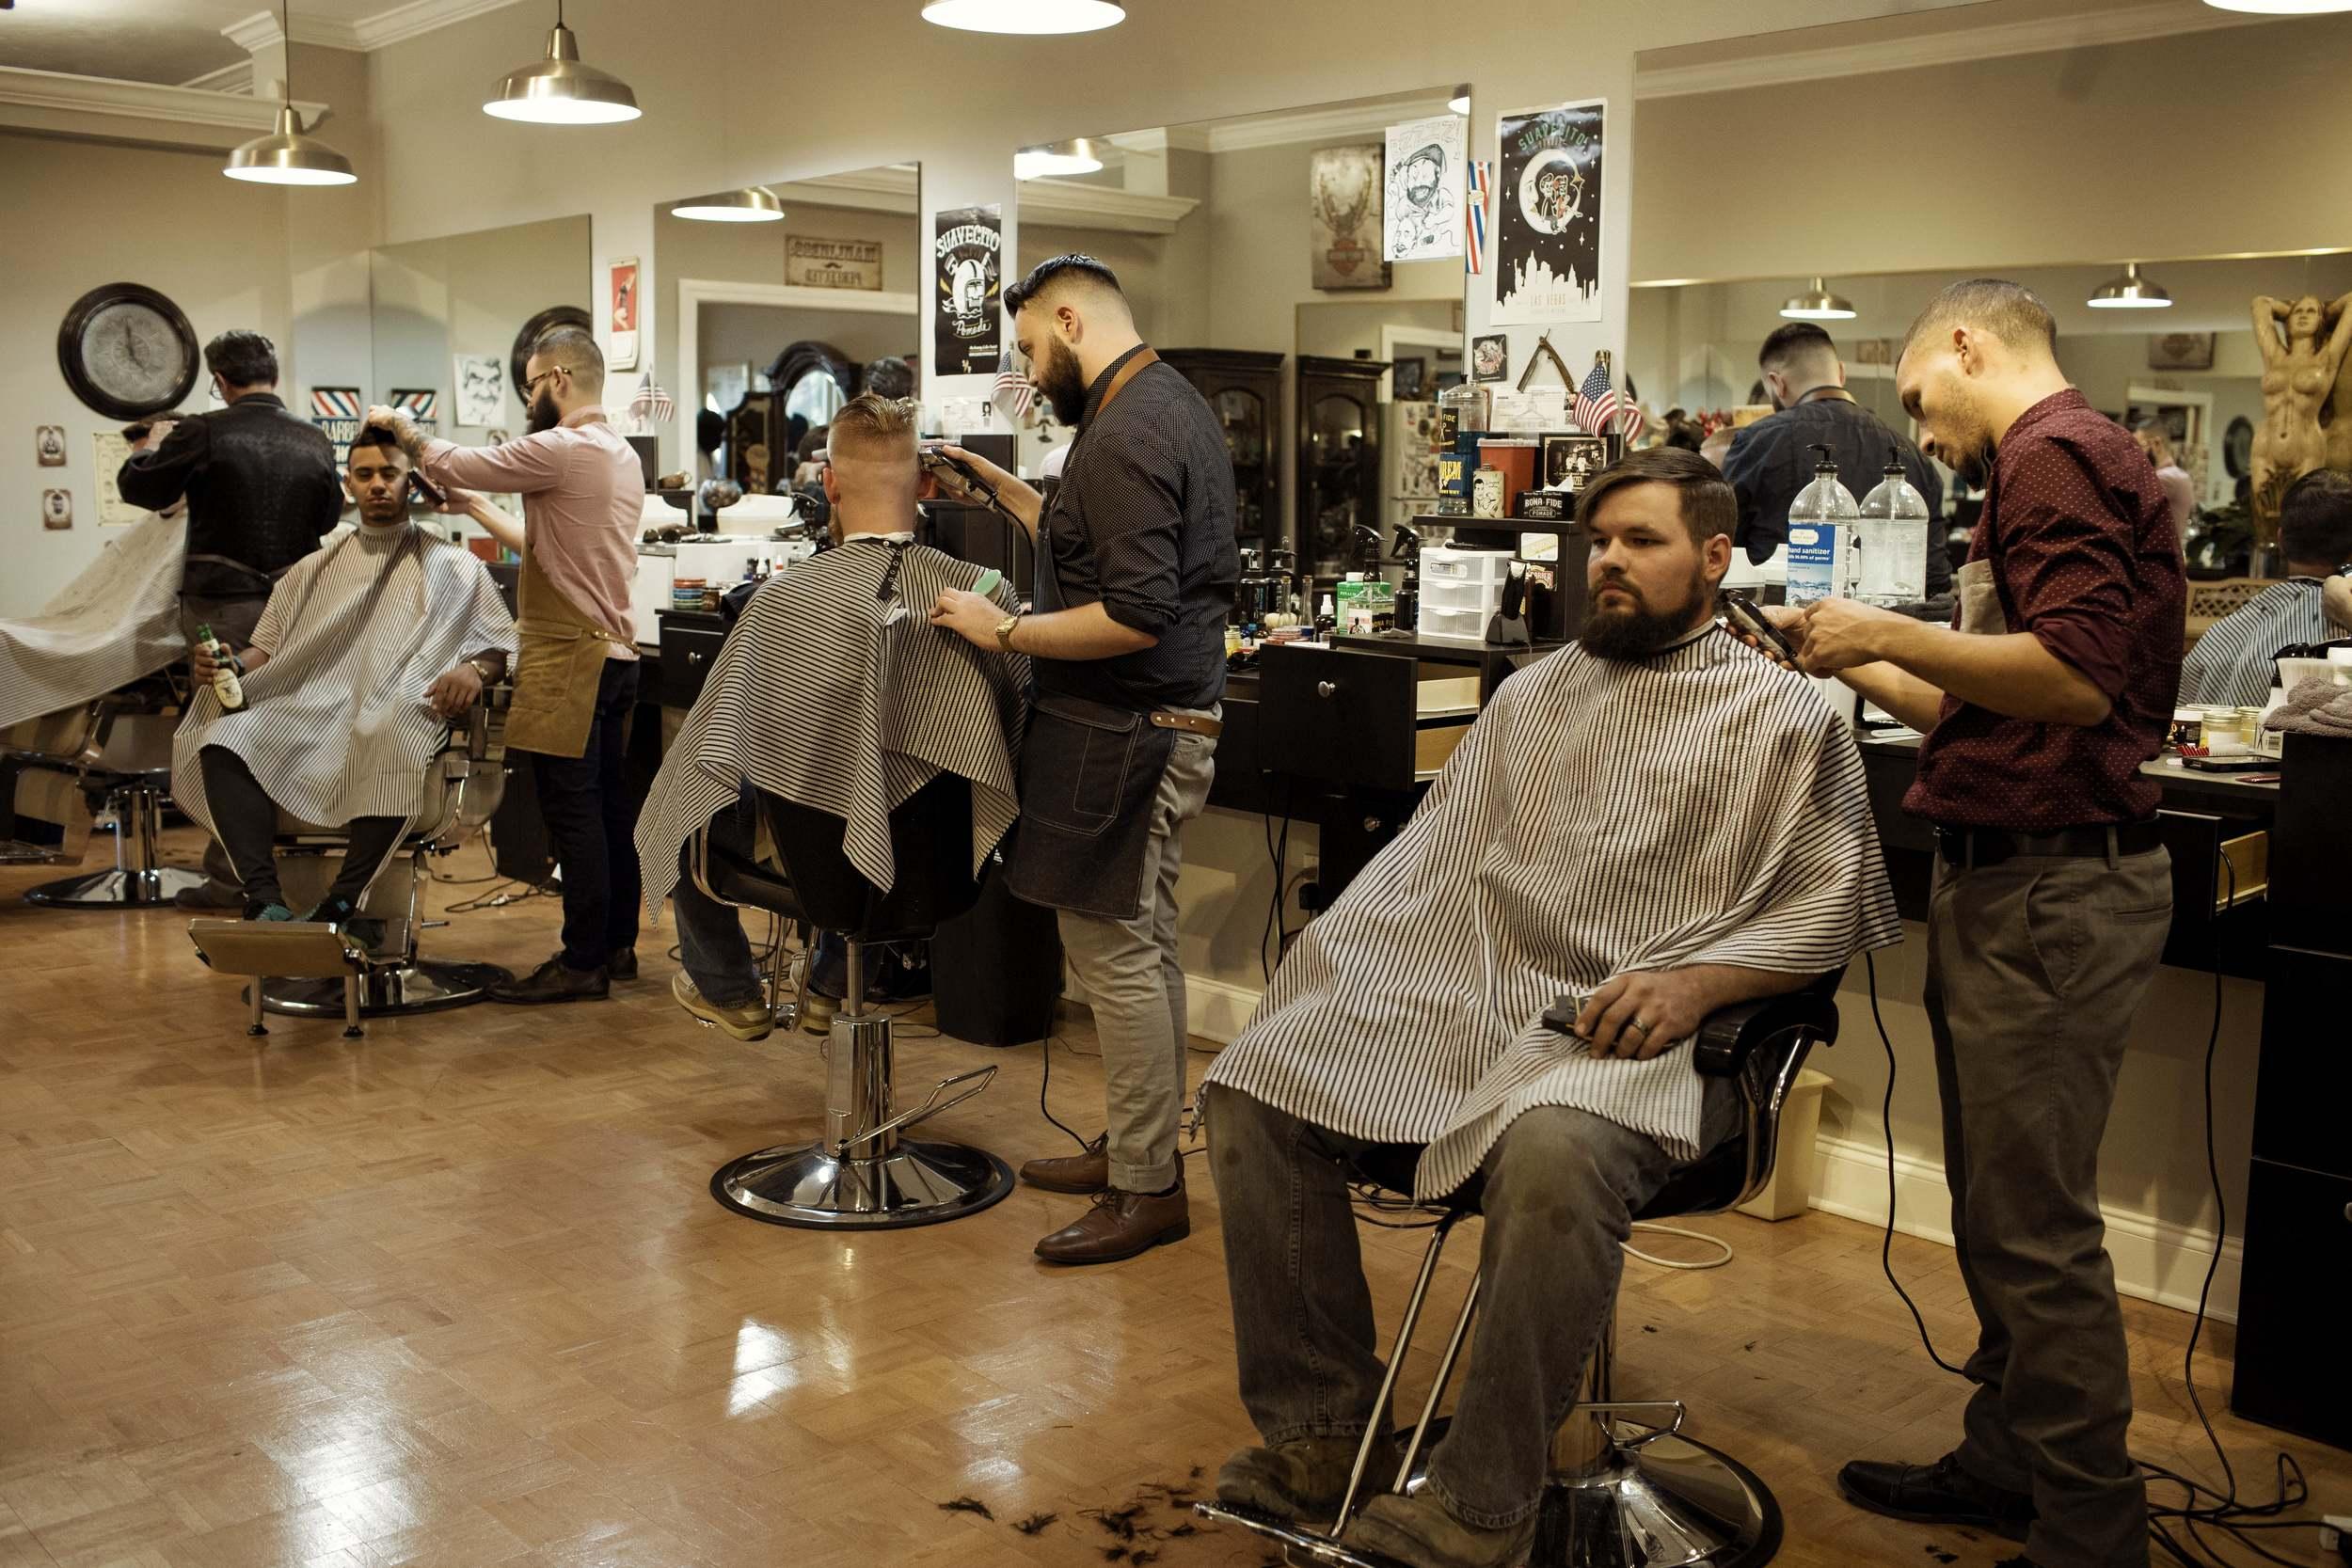 5th Avenue Barber Shave Shop